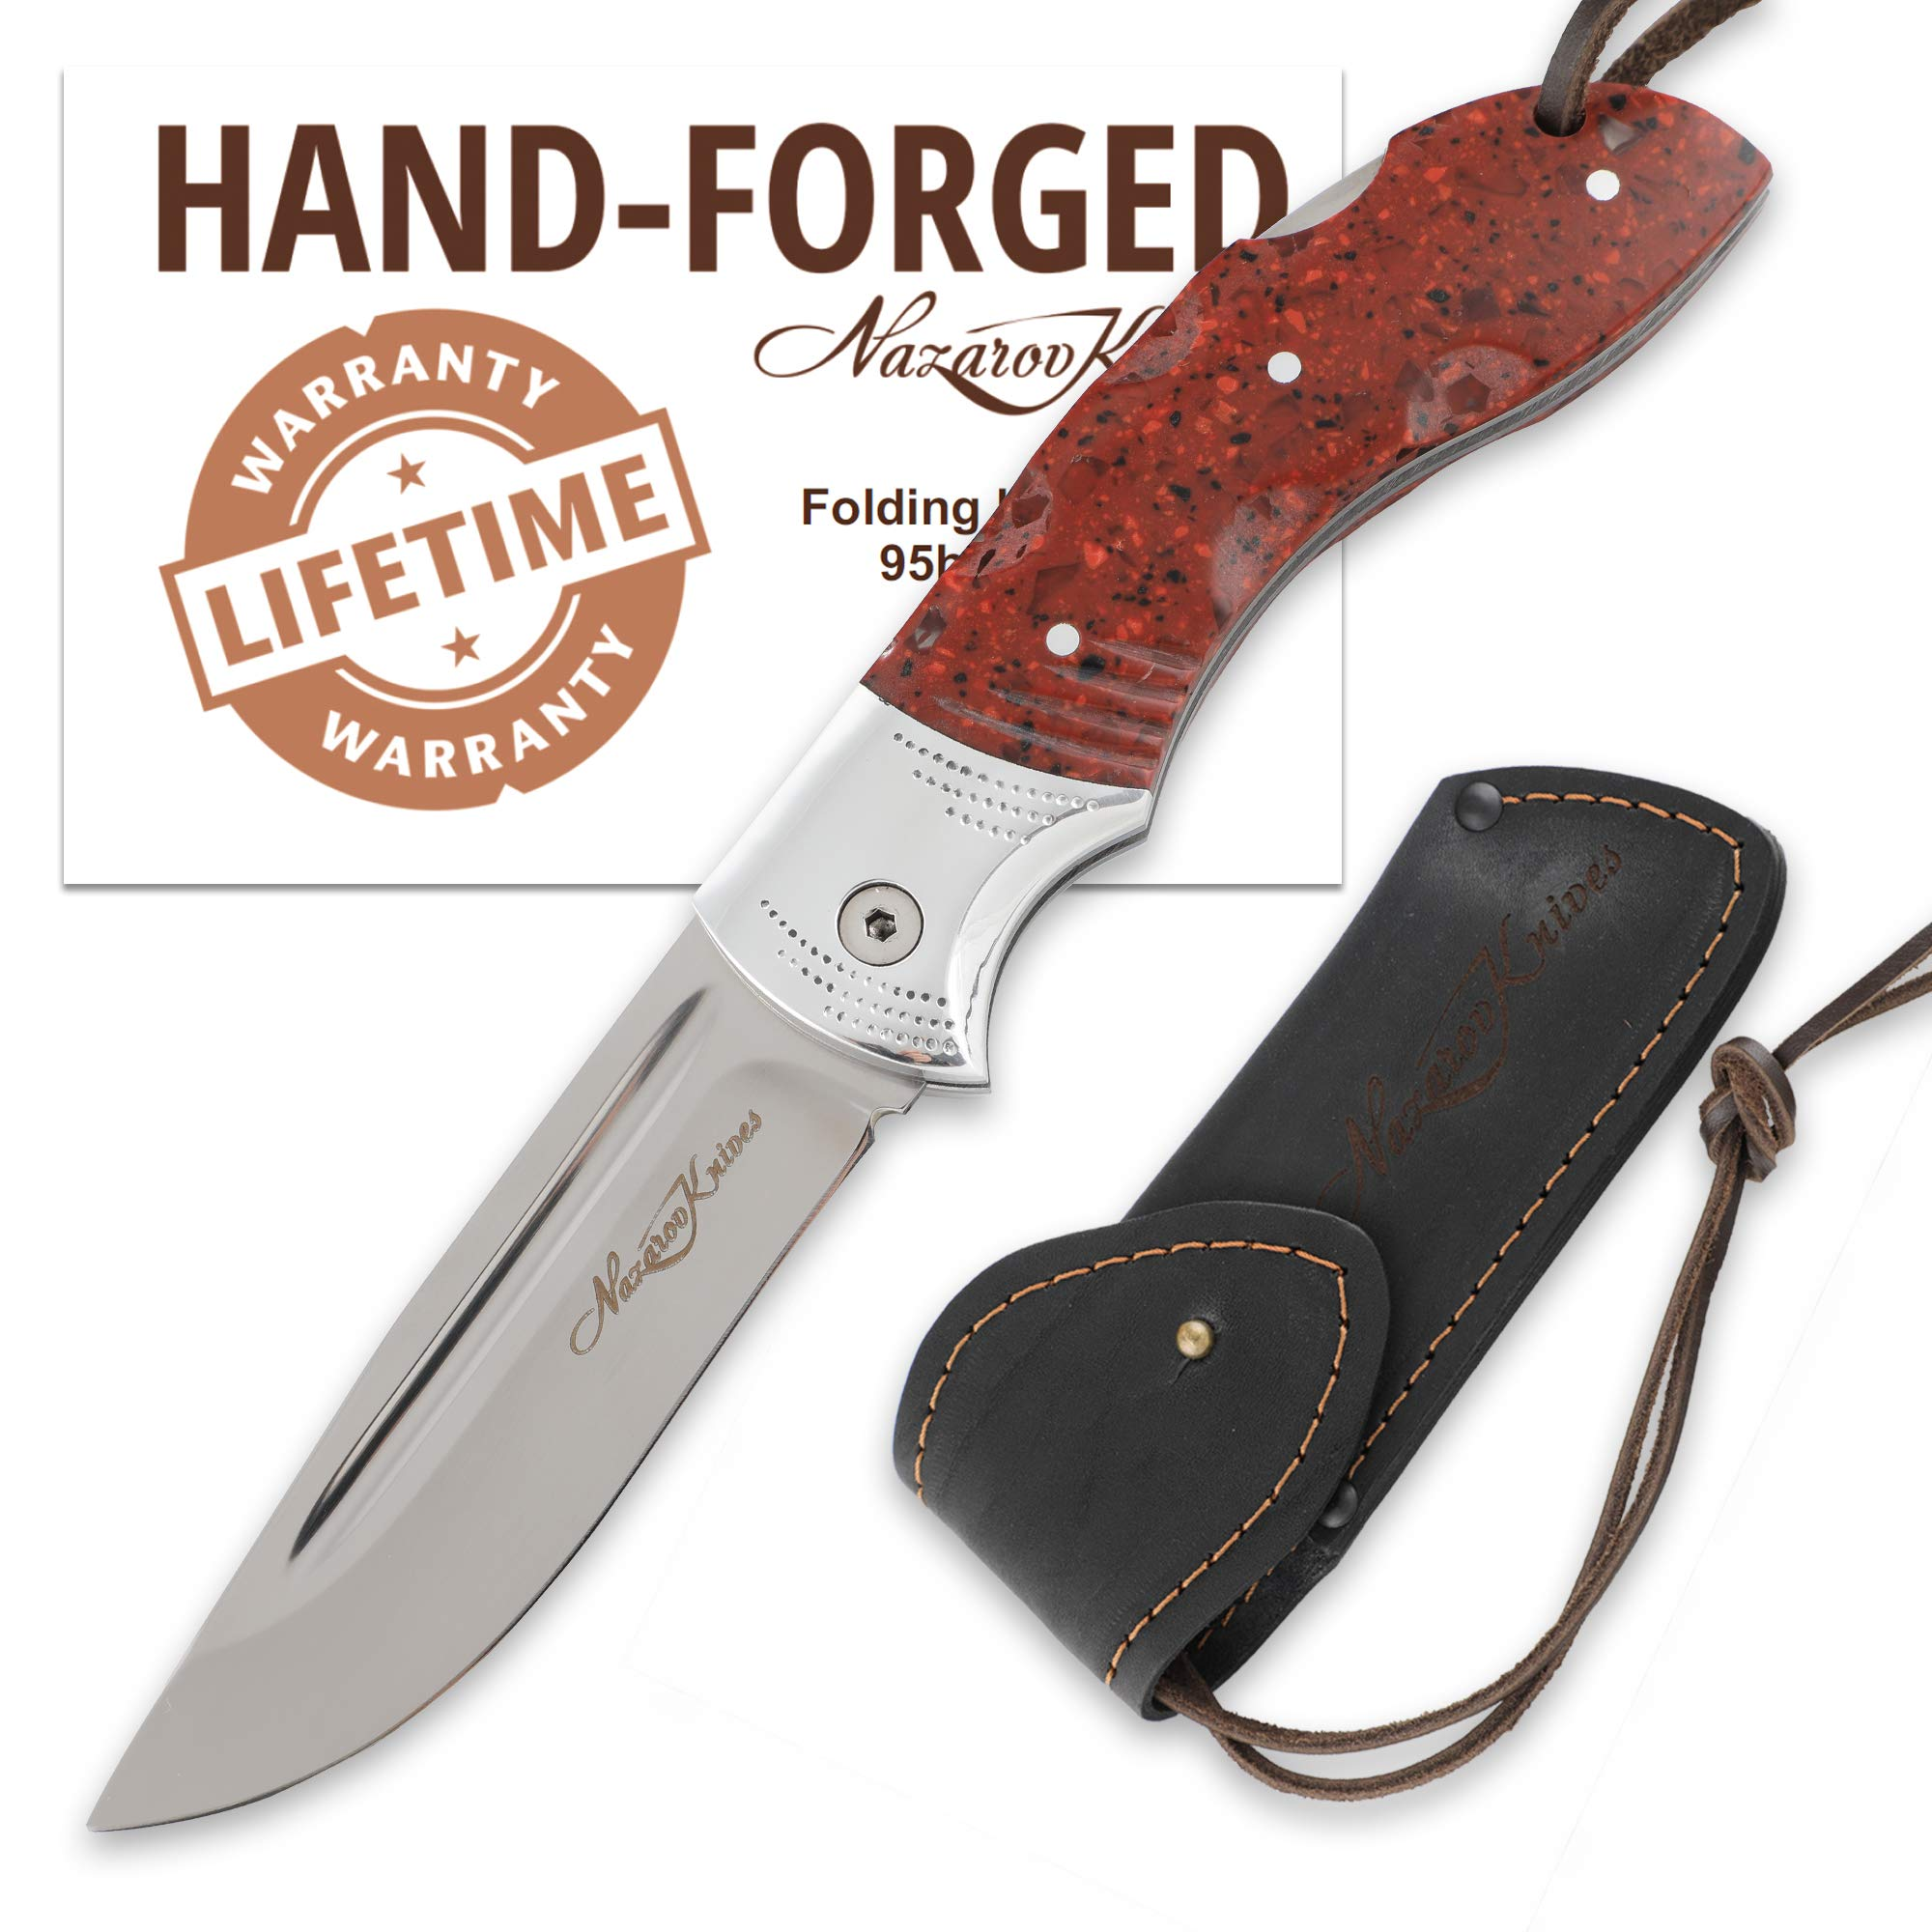 Nazarov Knives Folding Knife – Pocket Knife OWL – Stainless Steel – Acrylic Handle – Durable Leather Sheath